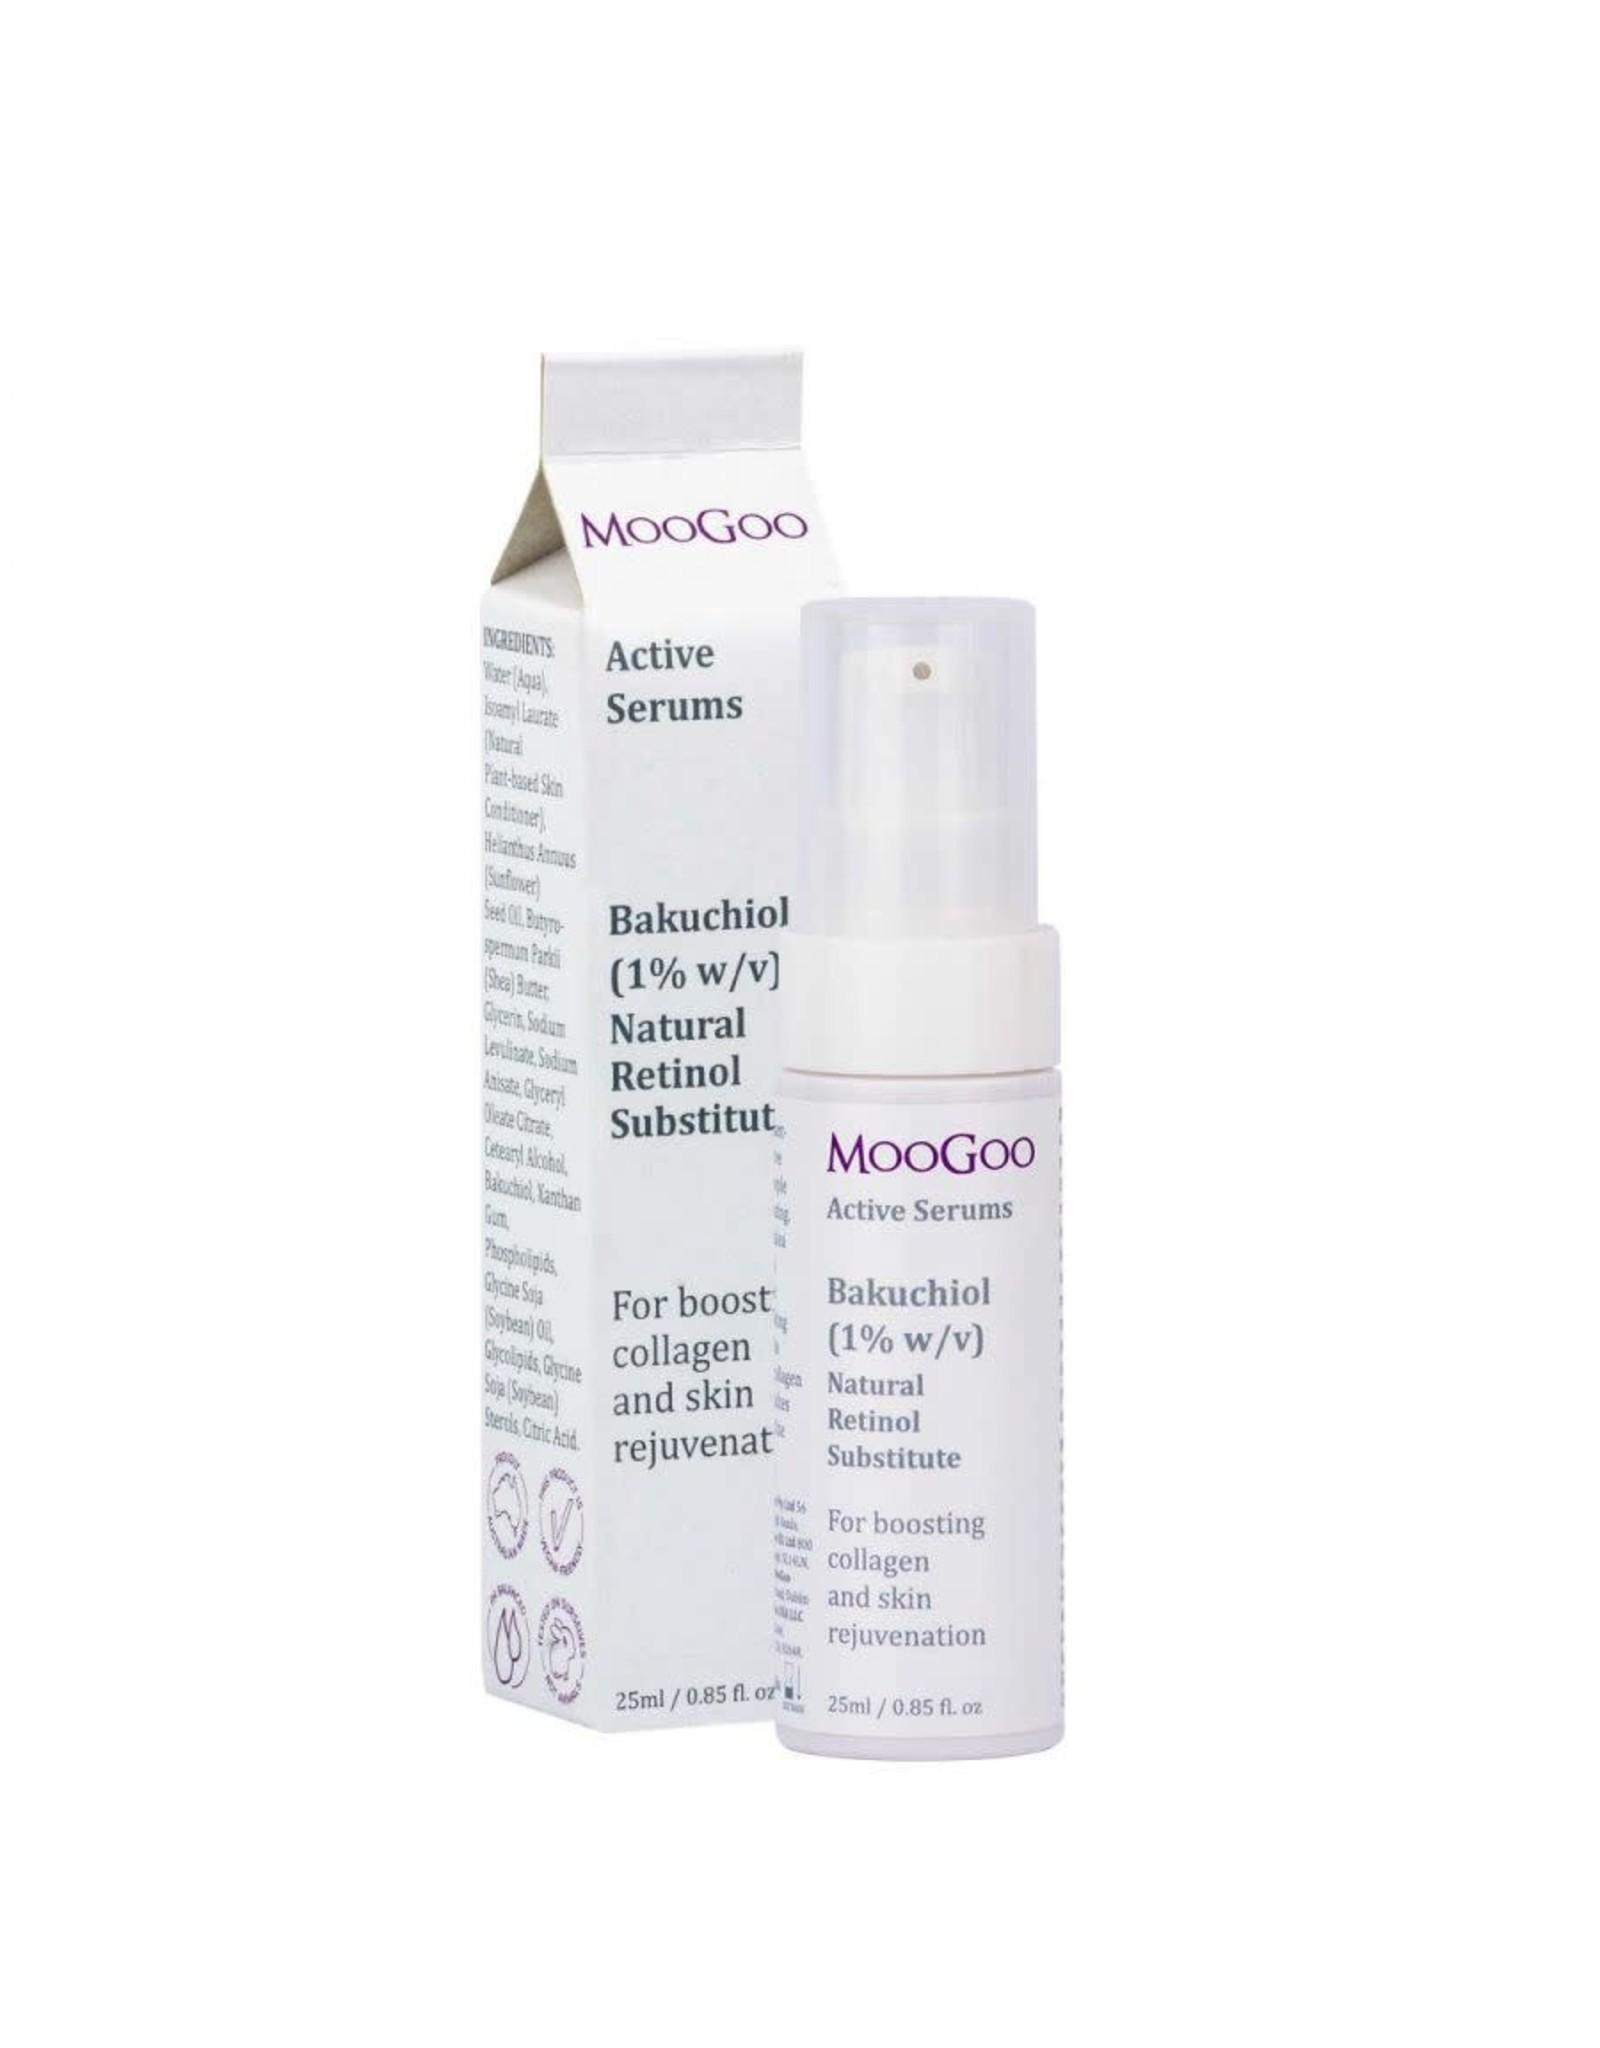 Moogoo Bakuchiol (1% w/v) Natural Retinol Substitute Active Serum 25ml